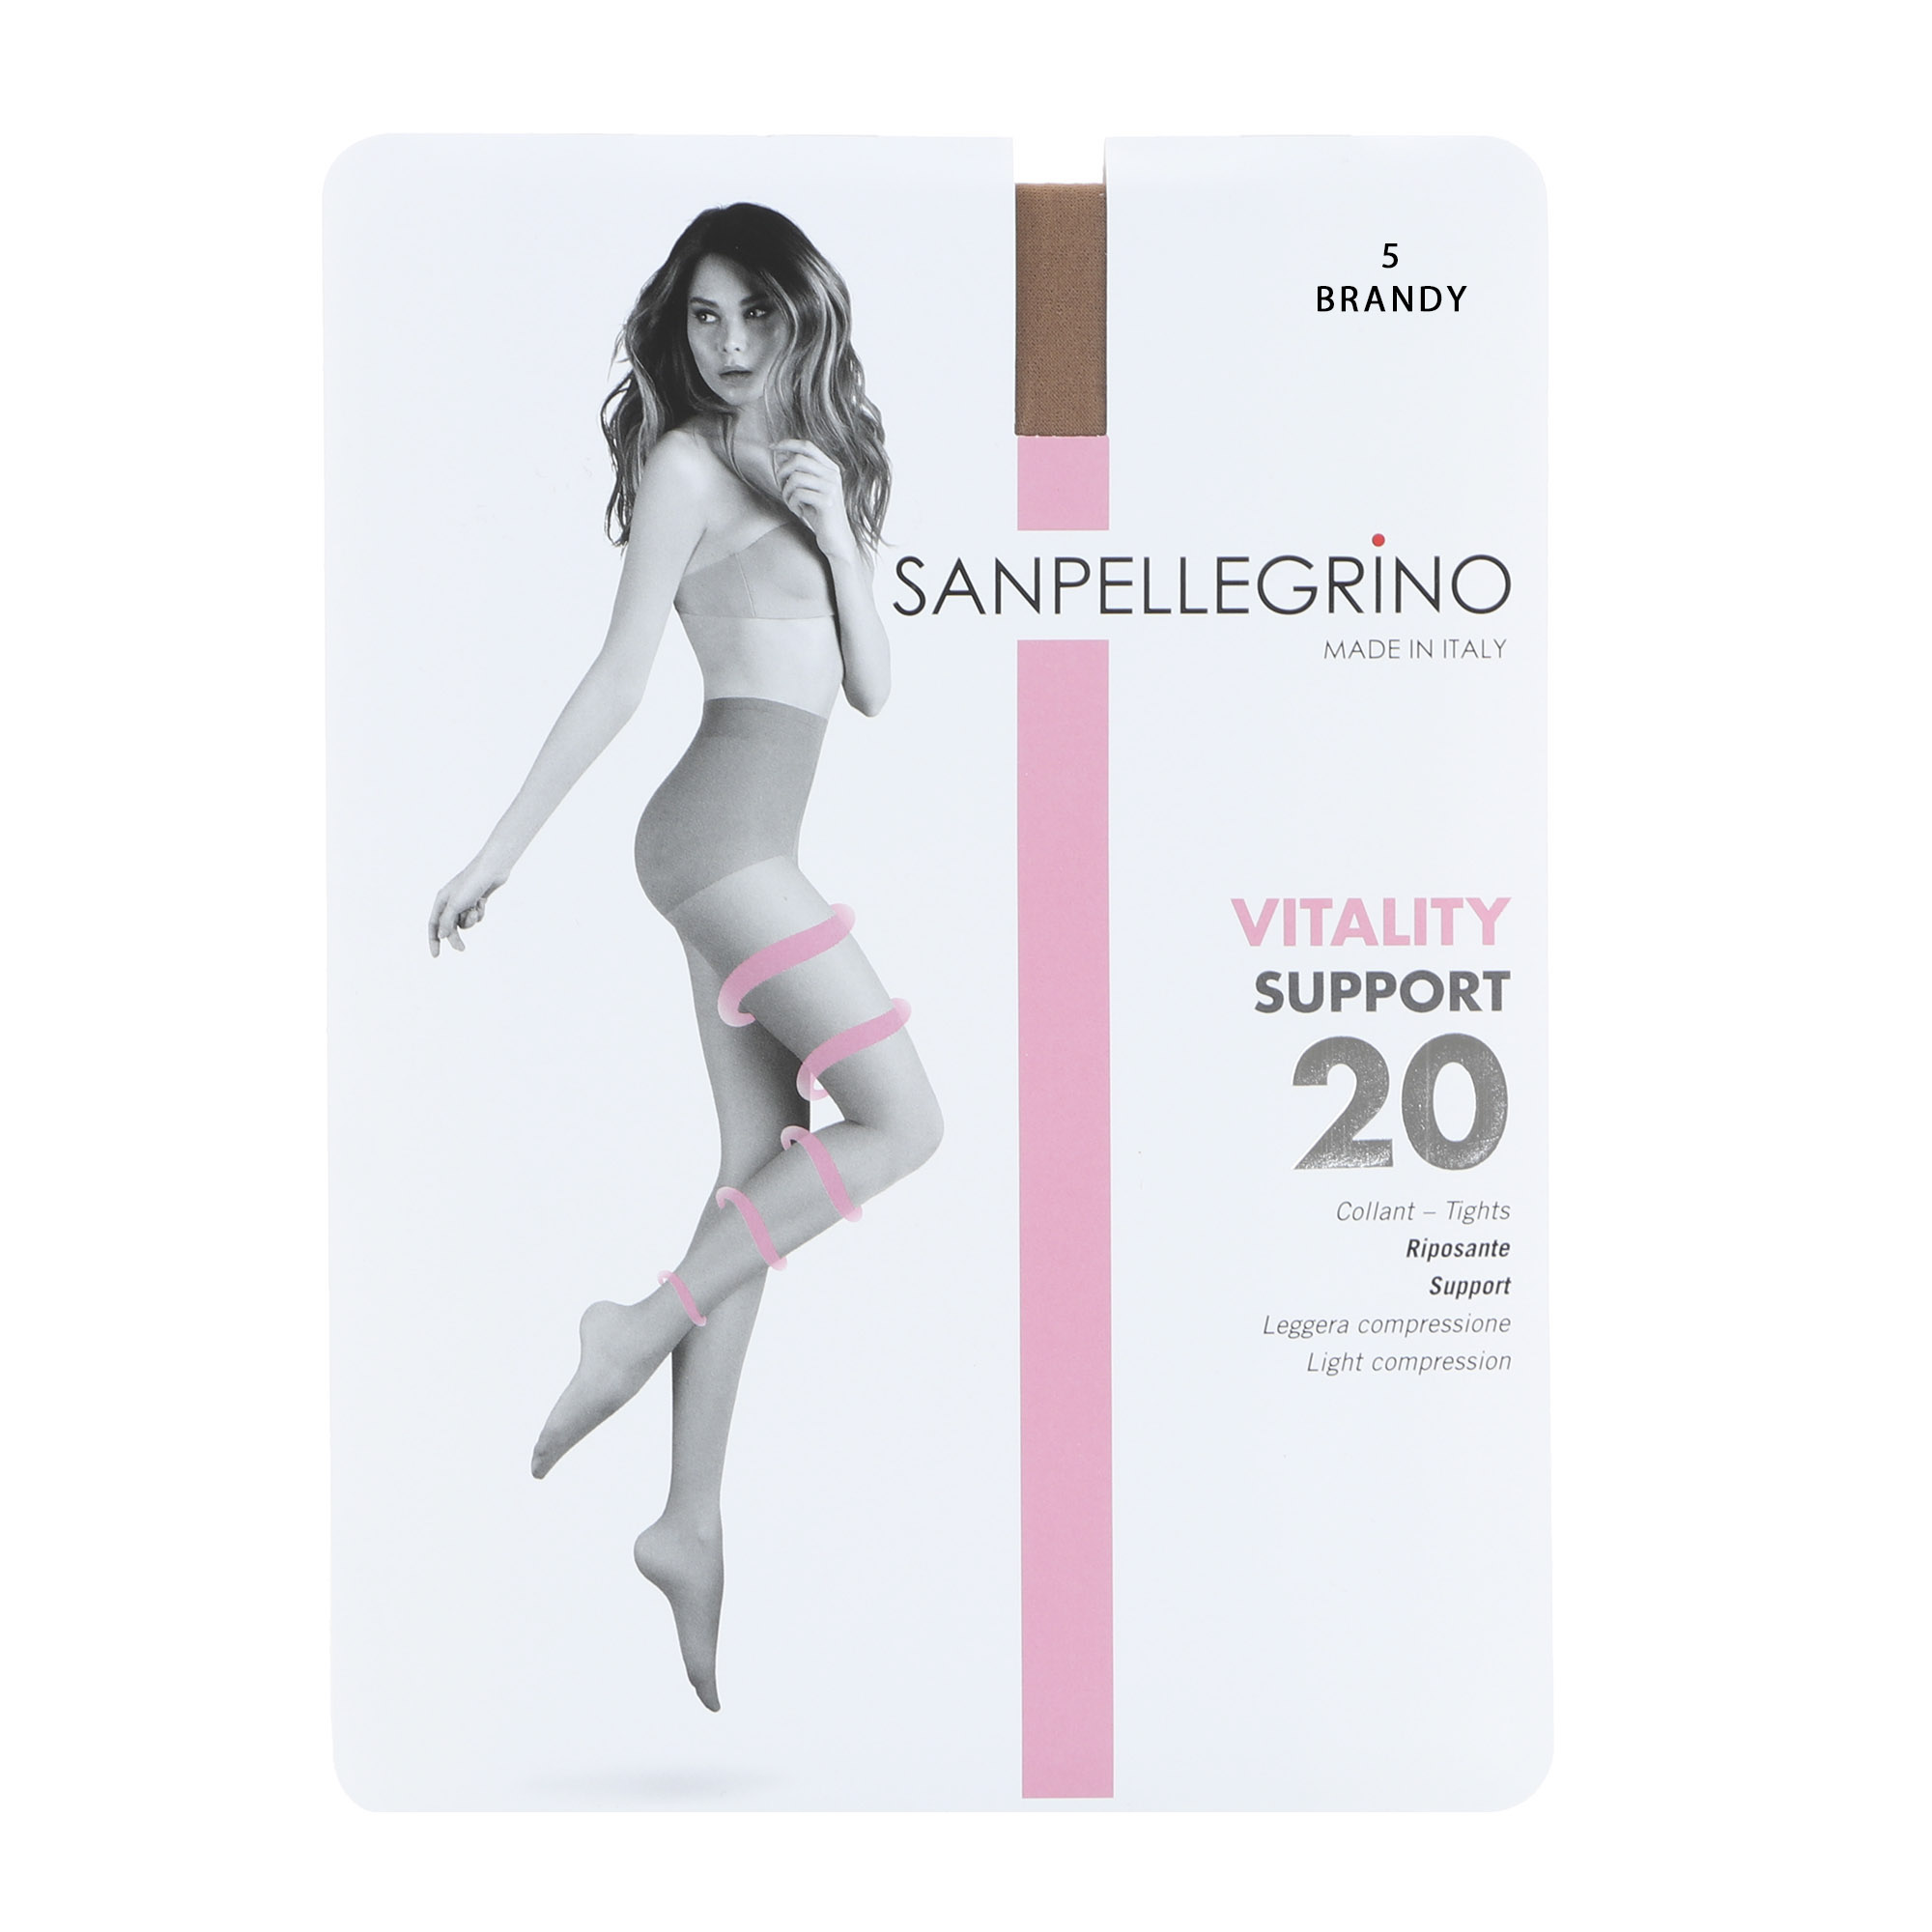 Колготки Sanpellegrino Support 20 Comfort Brandy Maxi недорого